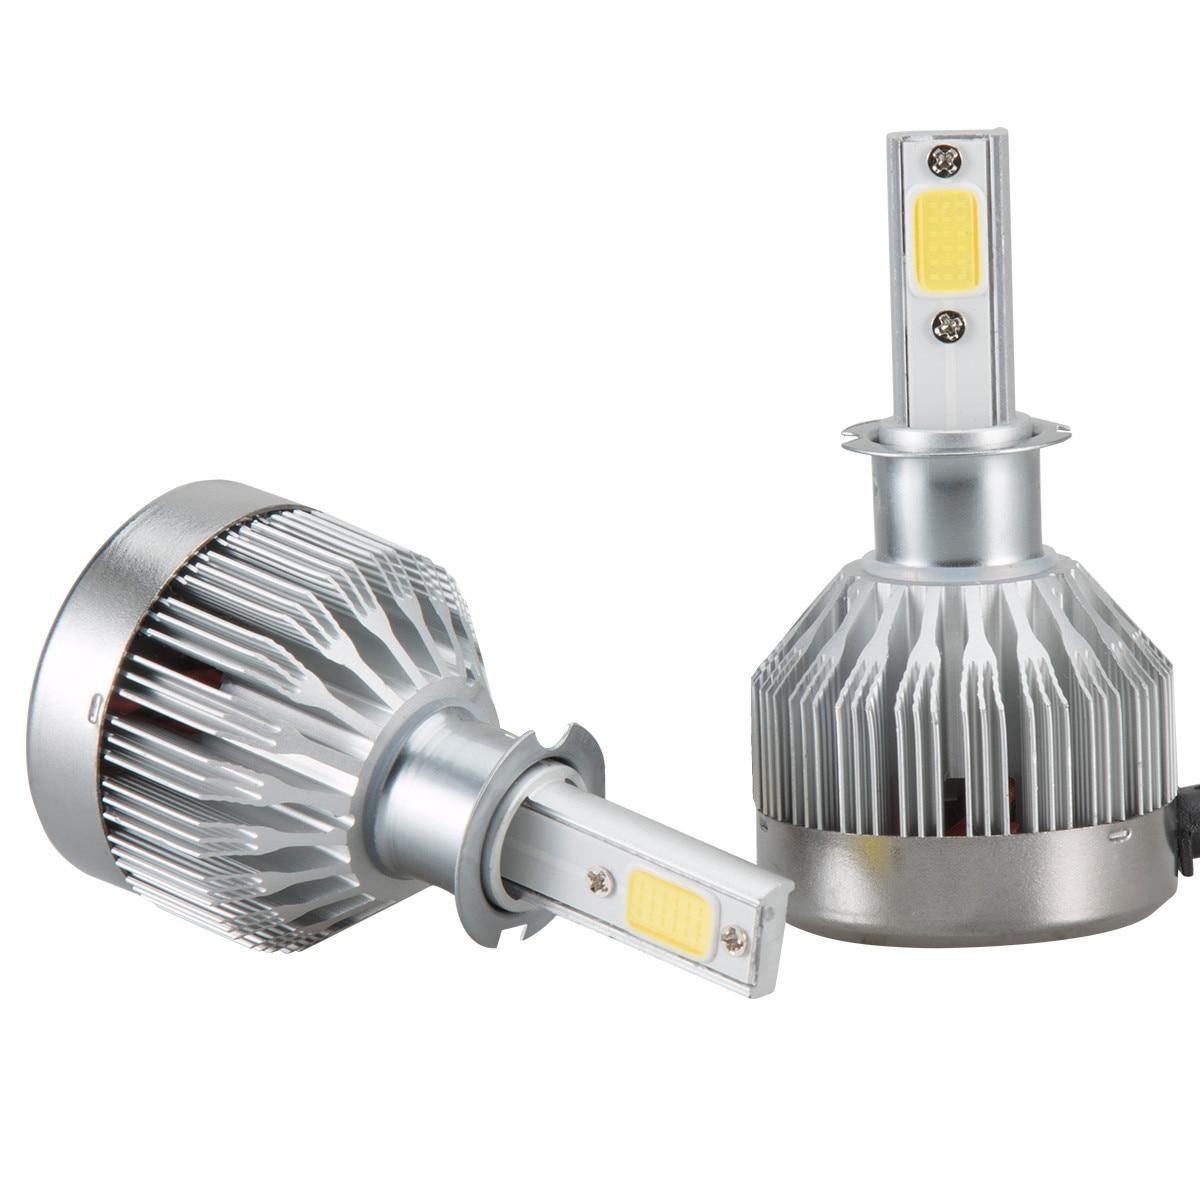 Super bright Car headlights 2x H3 LED Light Headlight Vehicle Car Hi/Lo Beam Bulb Kit 6000k 60W 6000LM @017